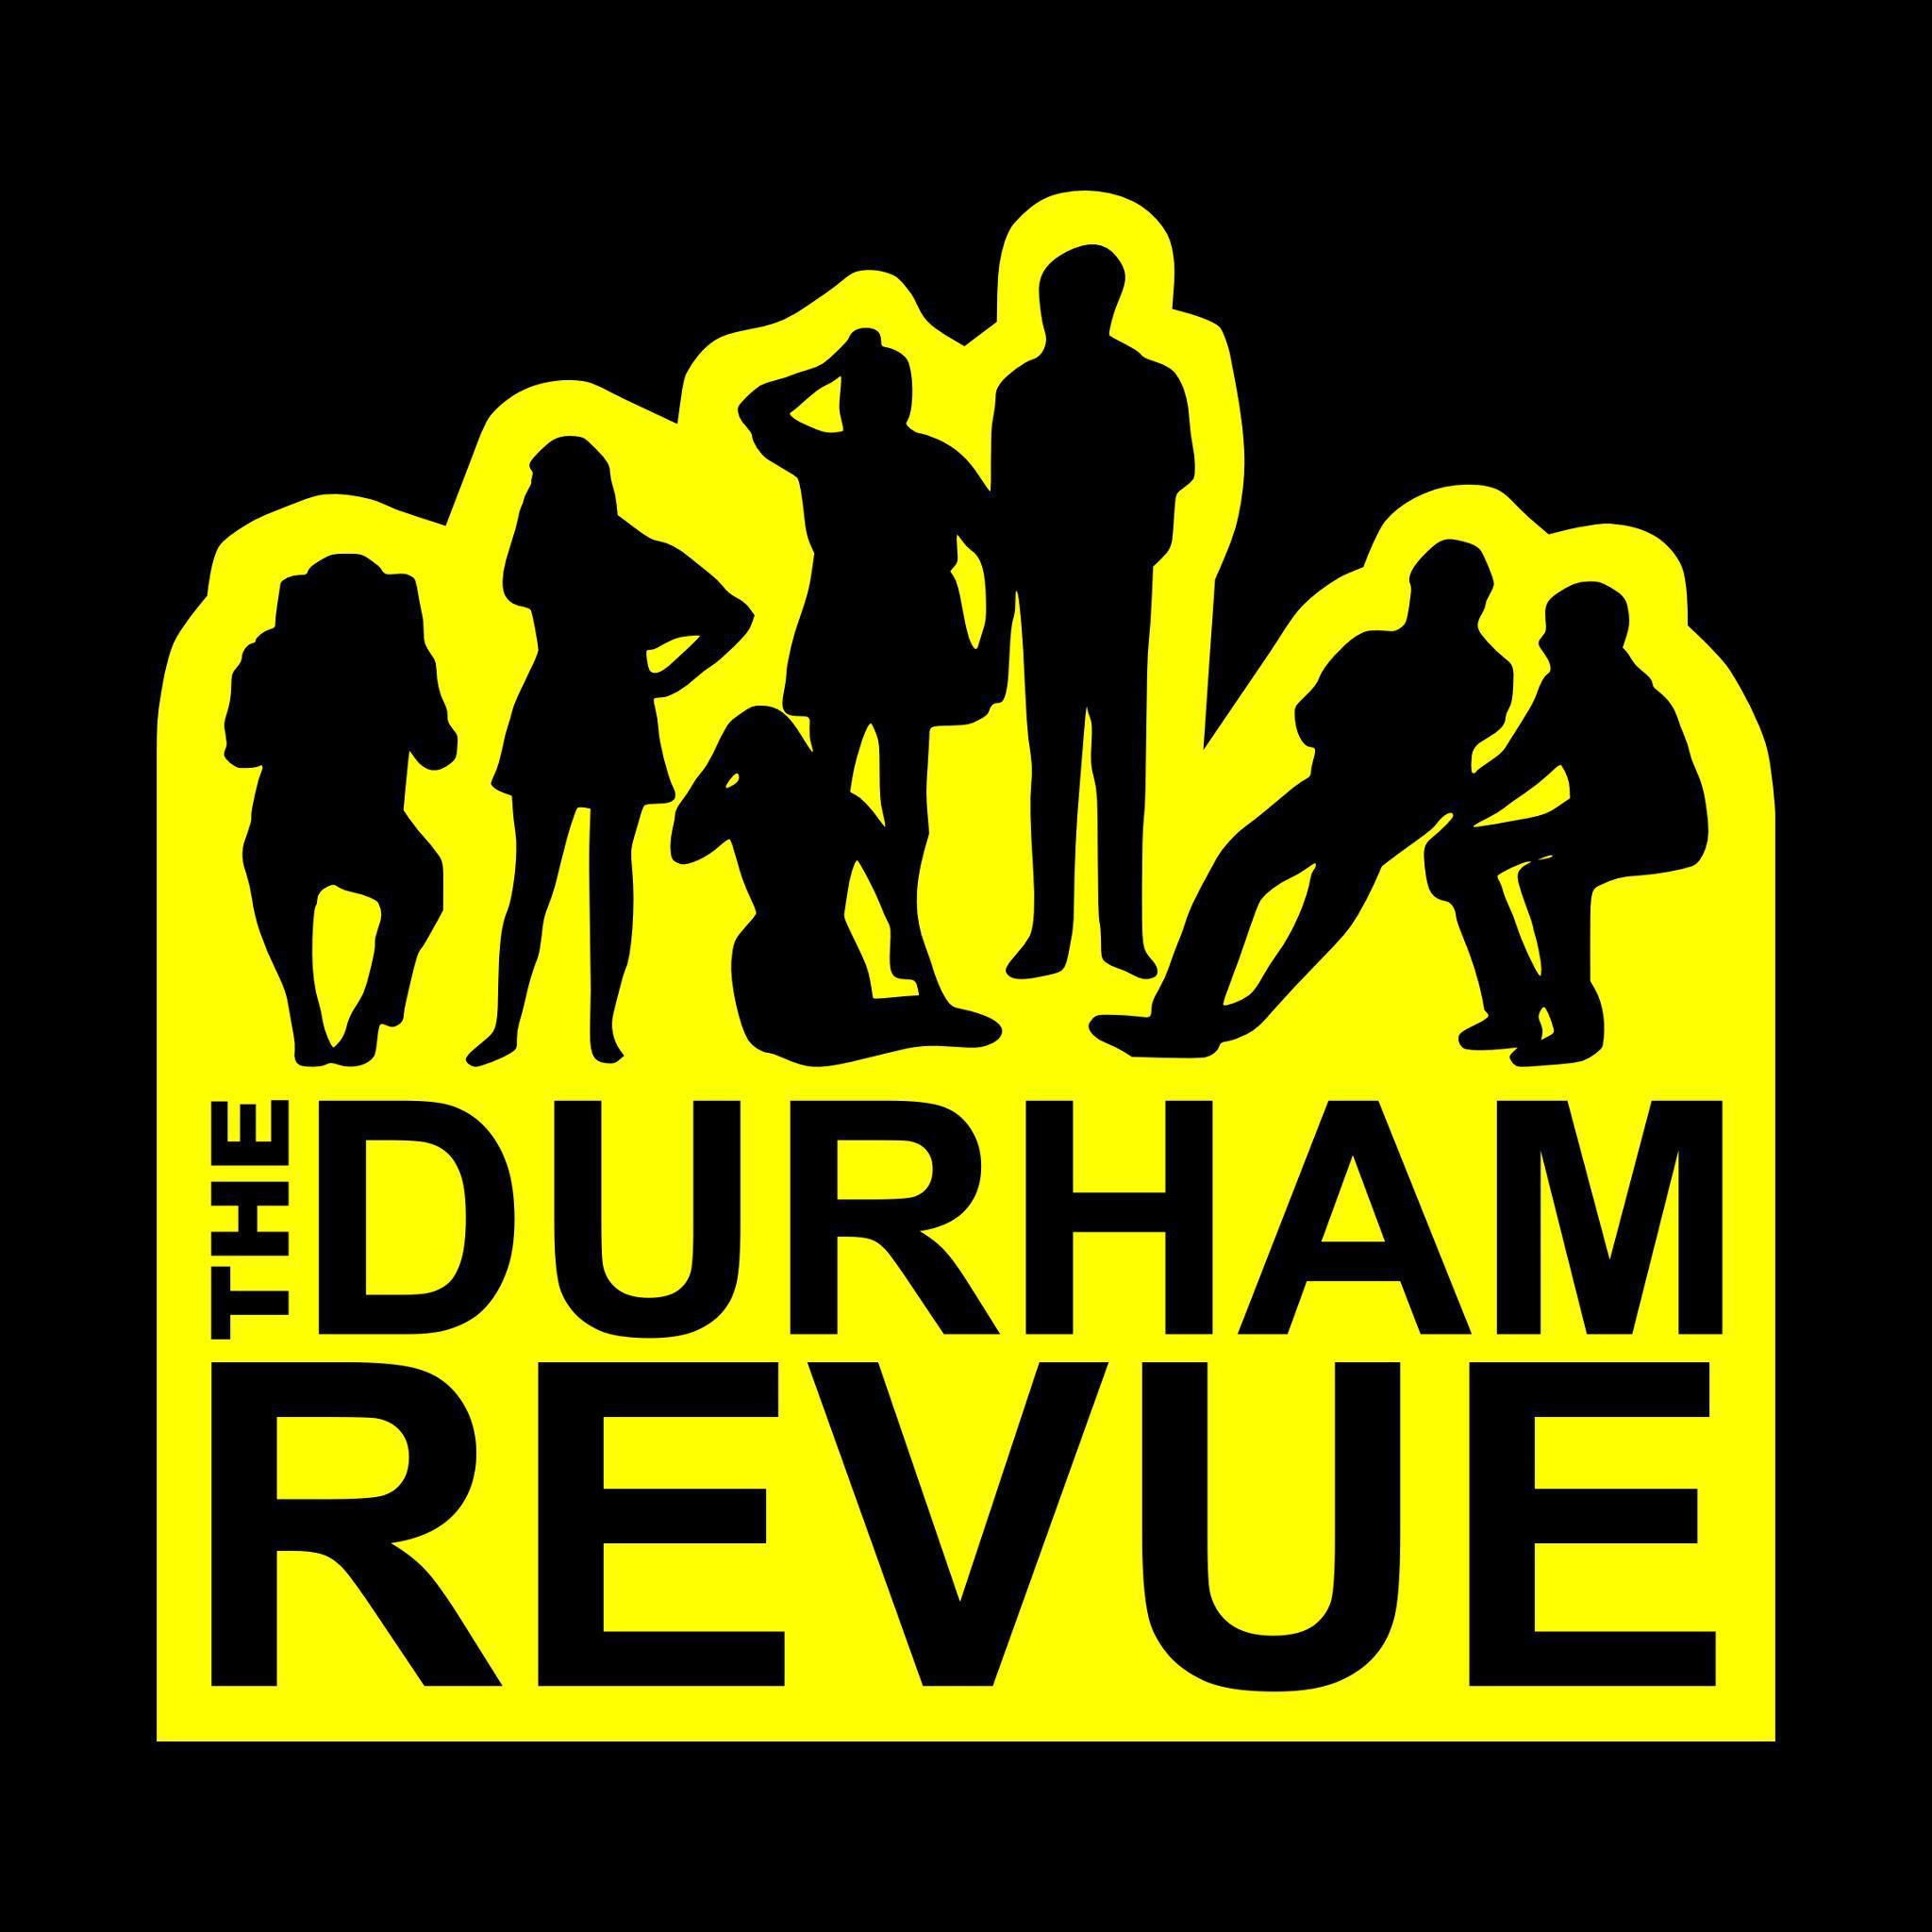 The Durham Revue Edinburgh Fringe